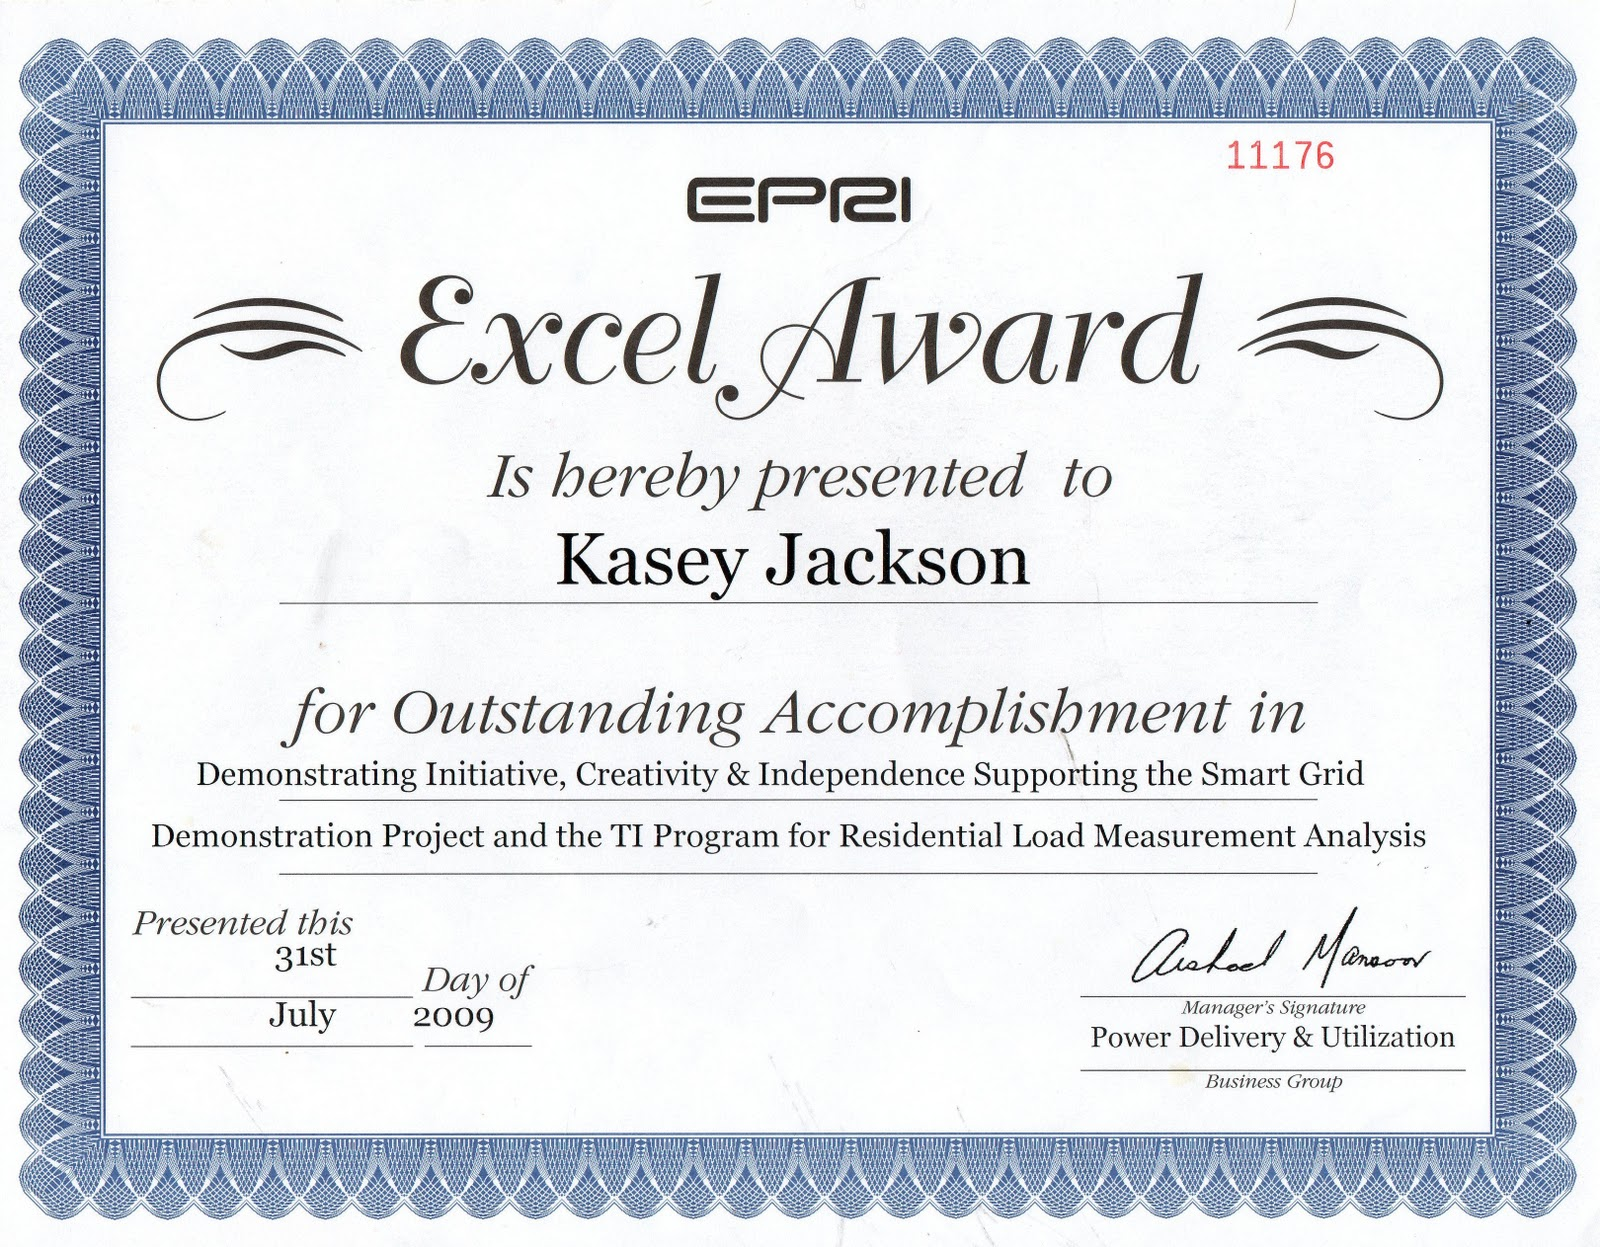 Kasey l jackson awards and certifications servsafe certification 2010 2014 xflitez Image collections